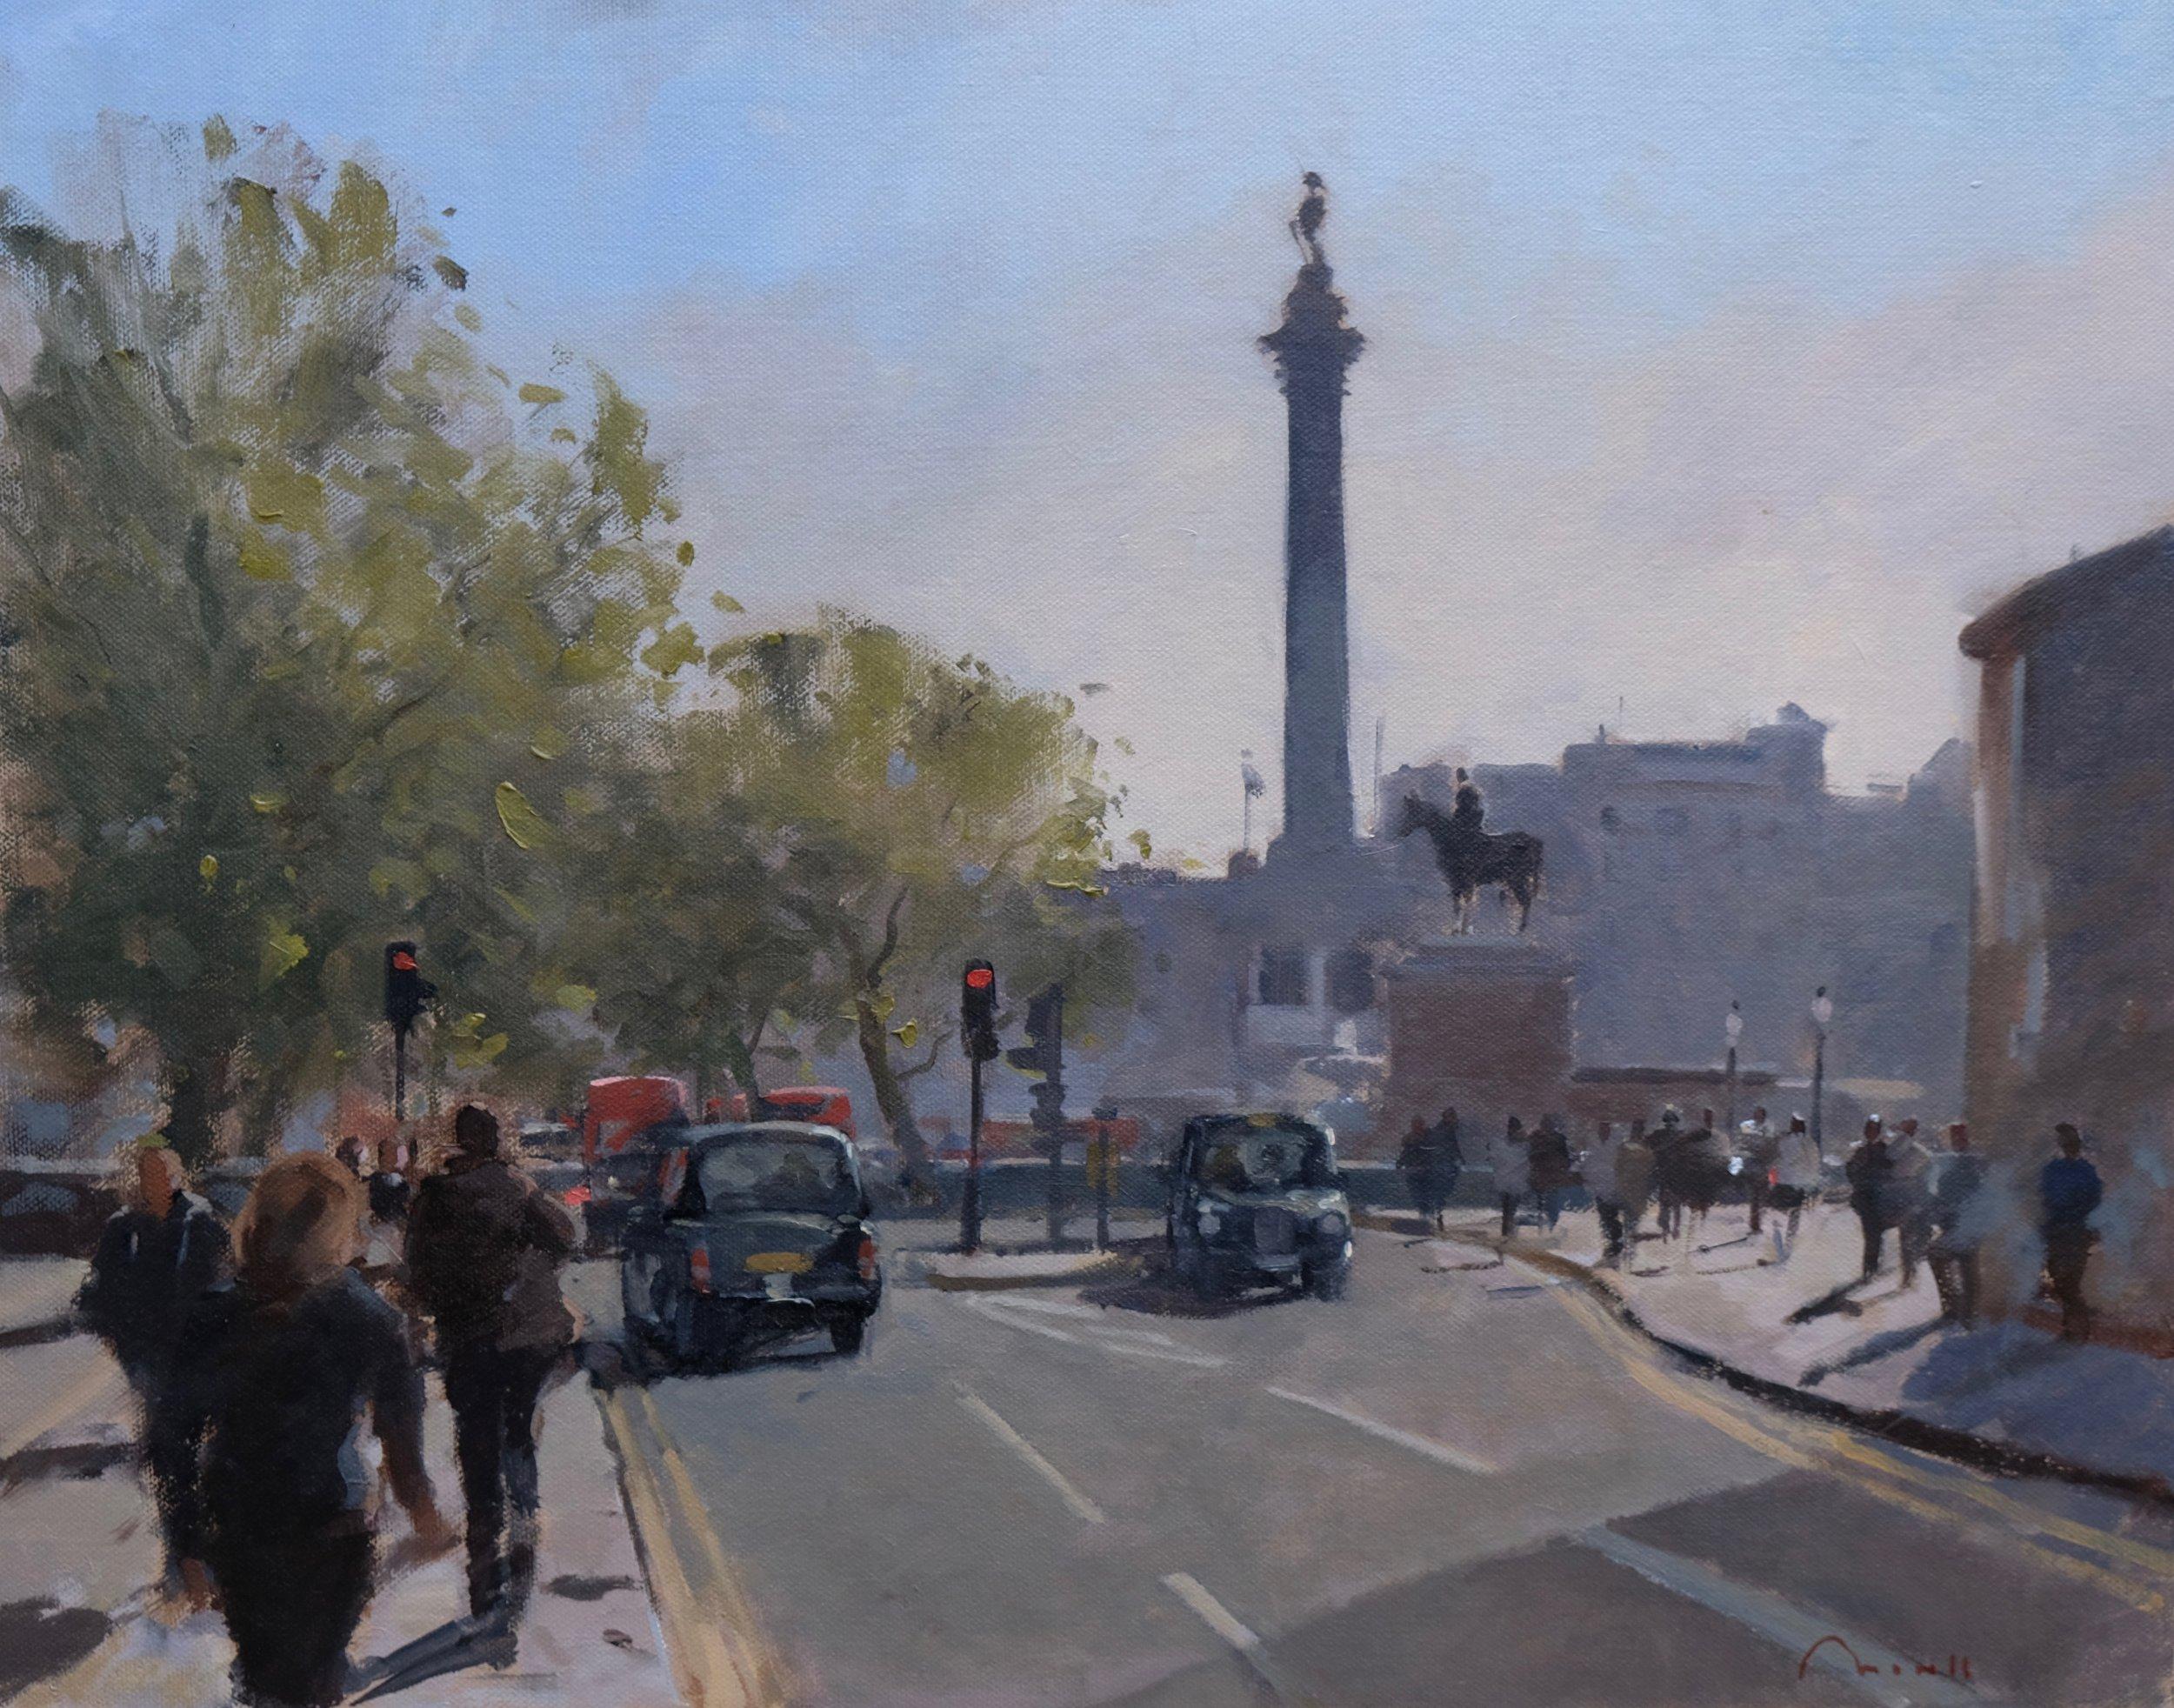 Trafalgar Square, London - Reference: BM/14265Oil, 50x60cm (unframed)£2,200